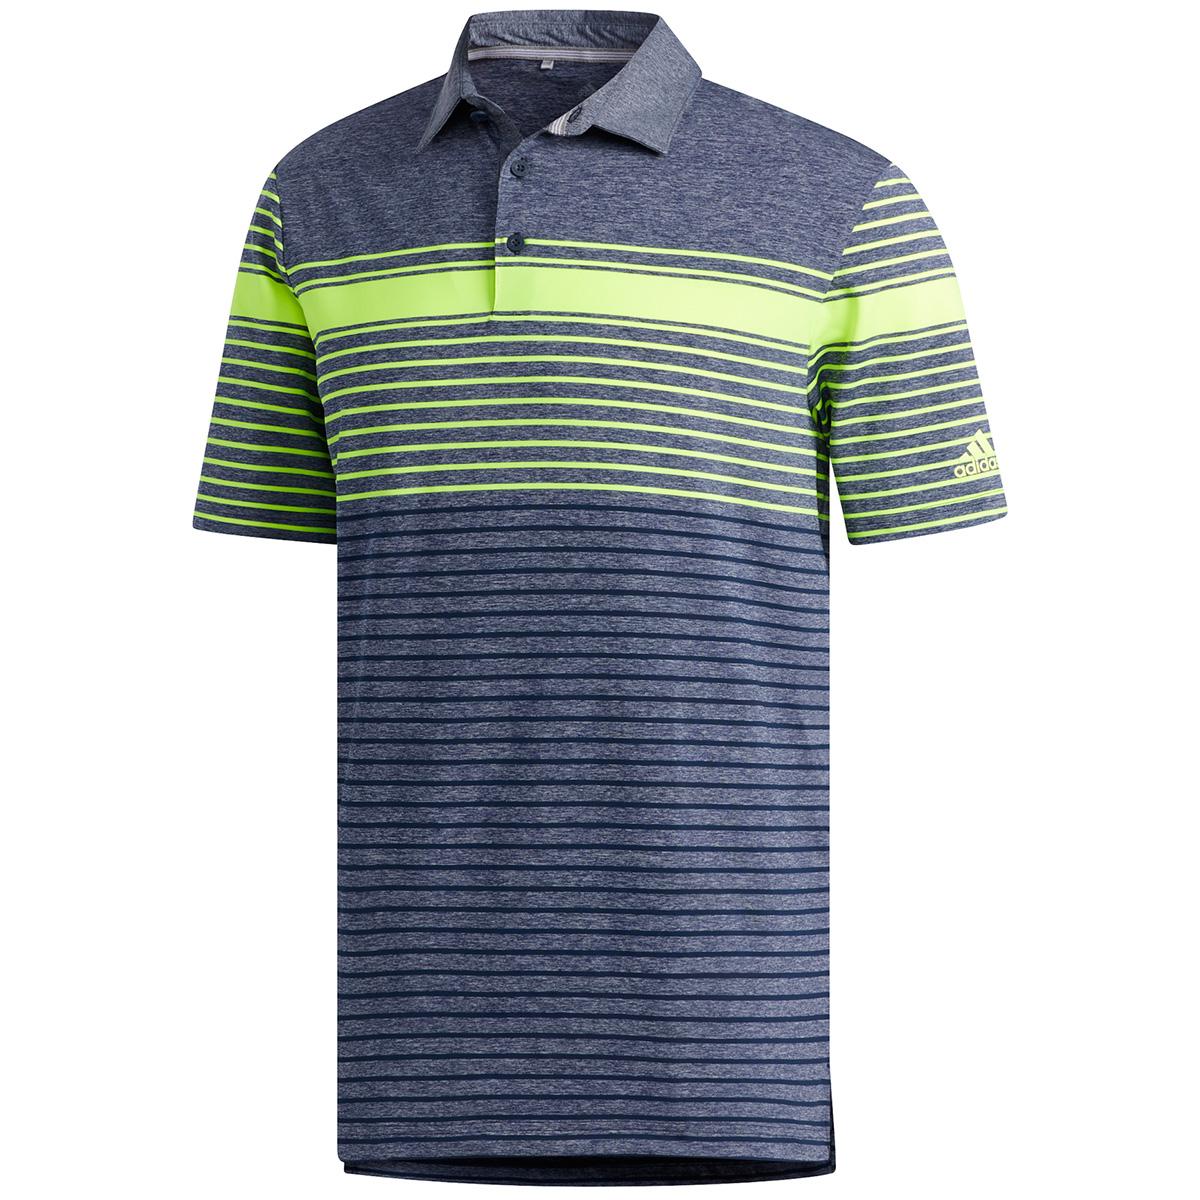 ULTIMATE365 マルチストライプ 半袖ポロシャツ